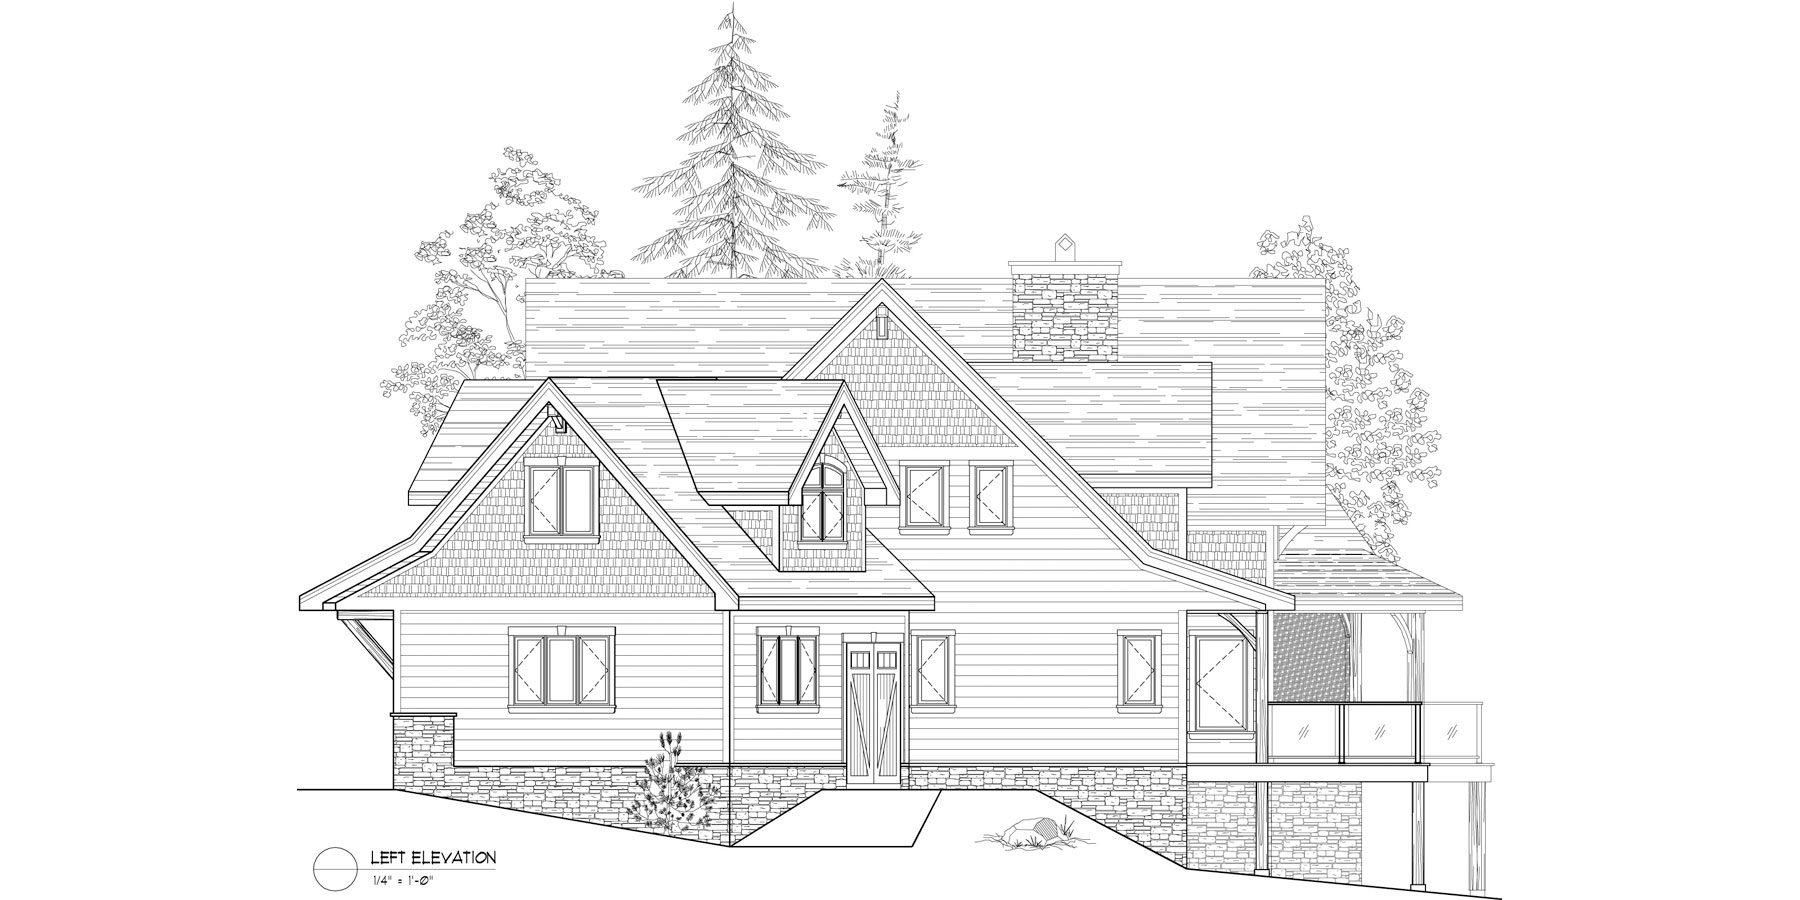 Normerica Timber Frame, House Plan, The Kearns 3510, Left Elevation